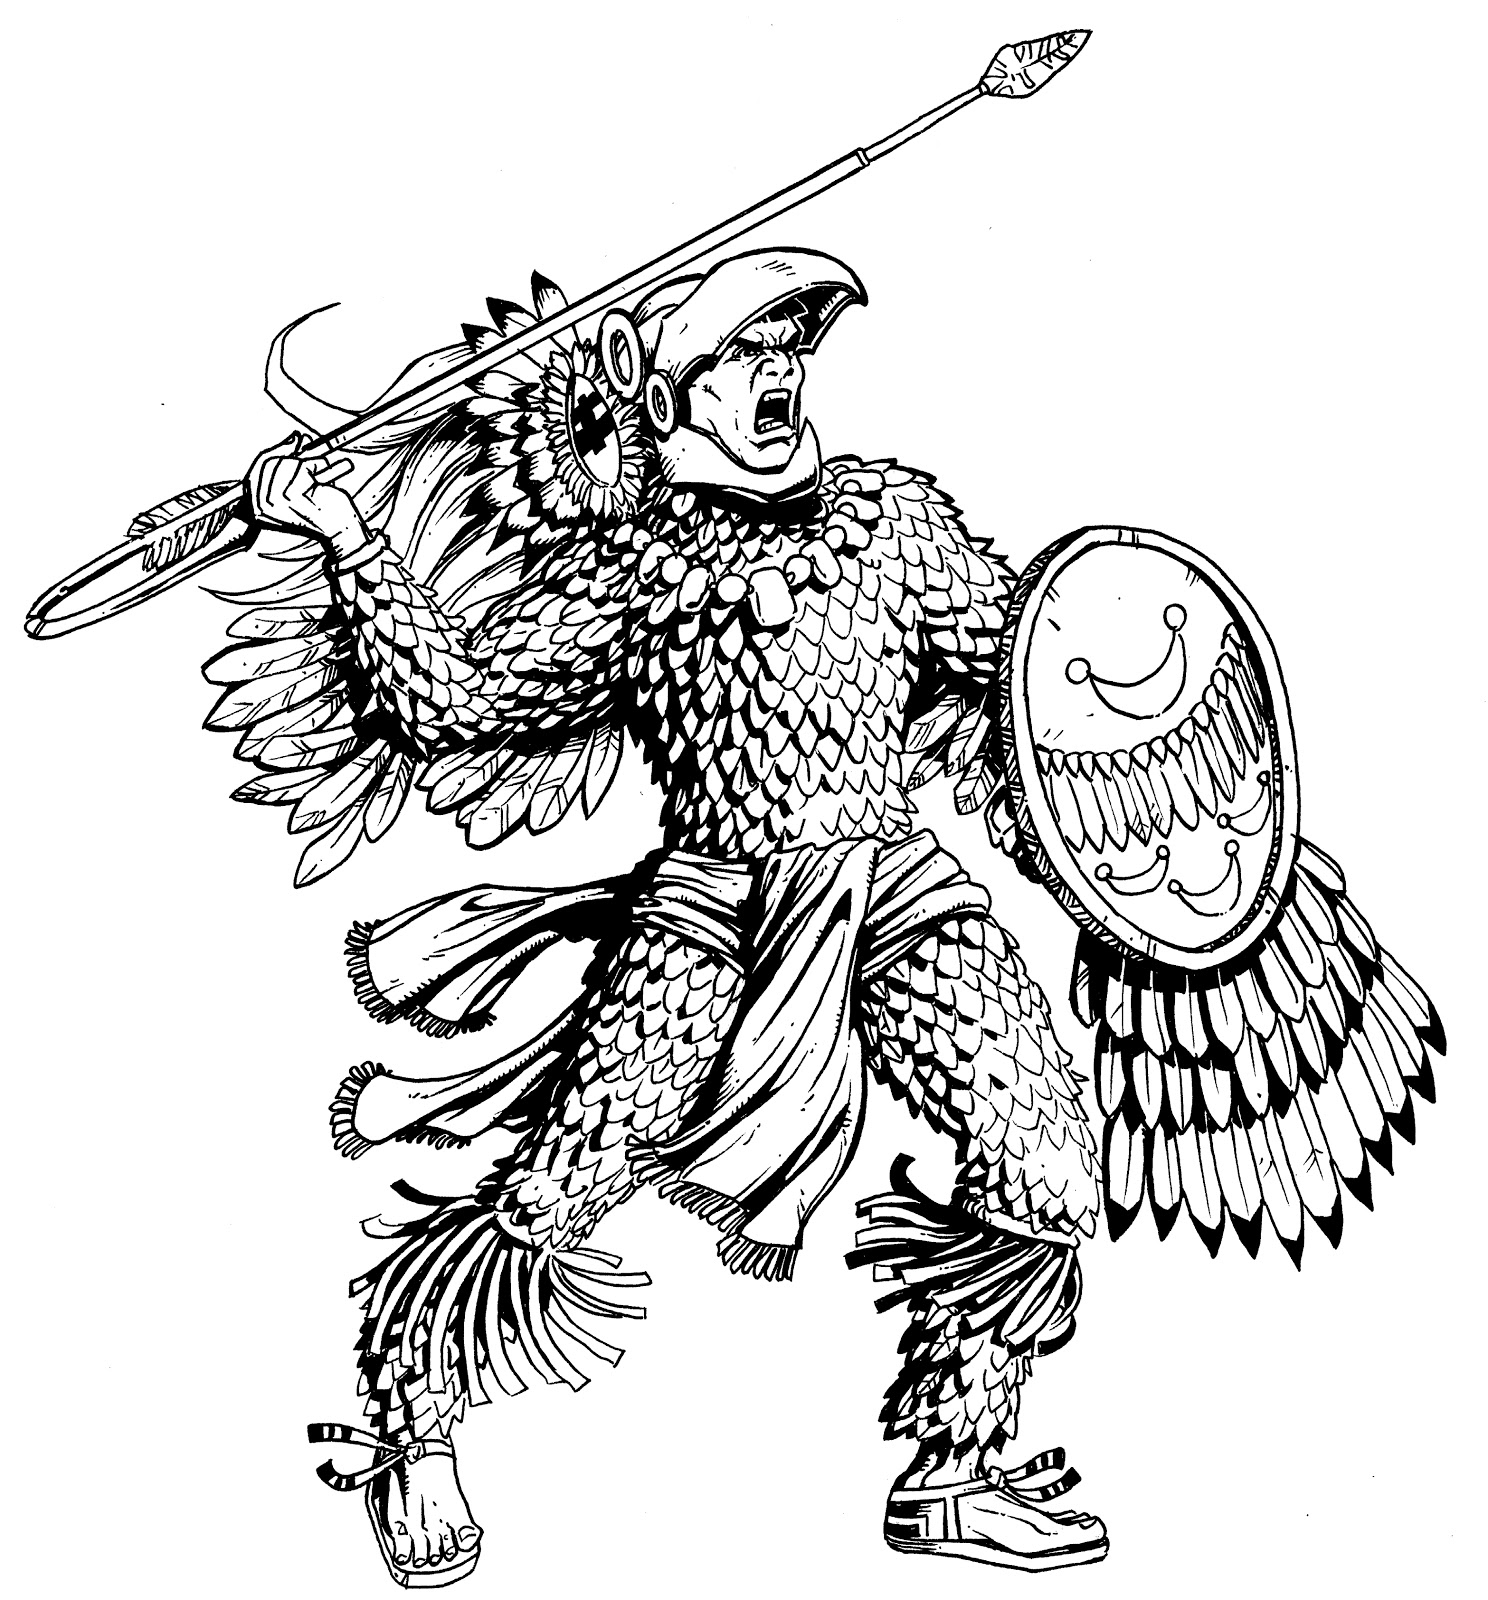 Warriors in art: Eagle Warrior by Chris Meeks